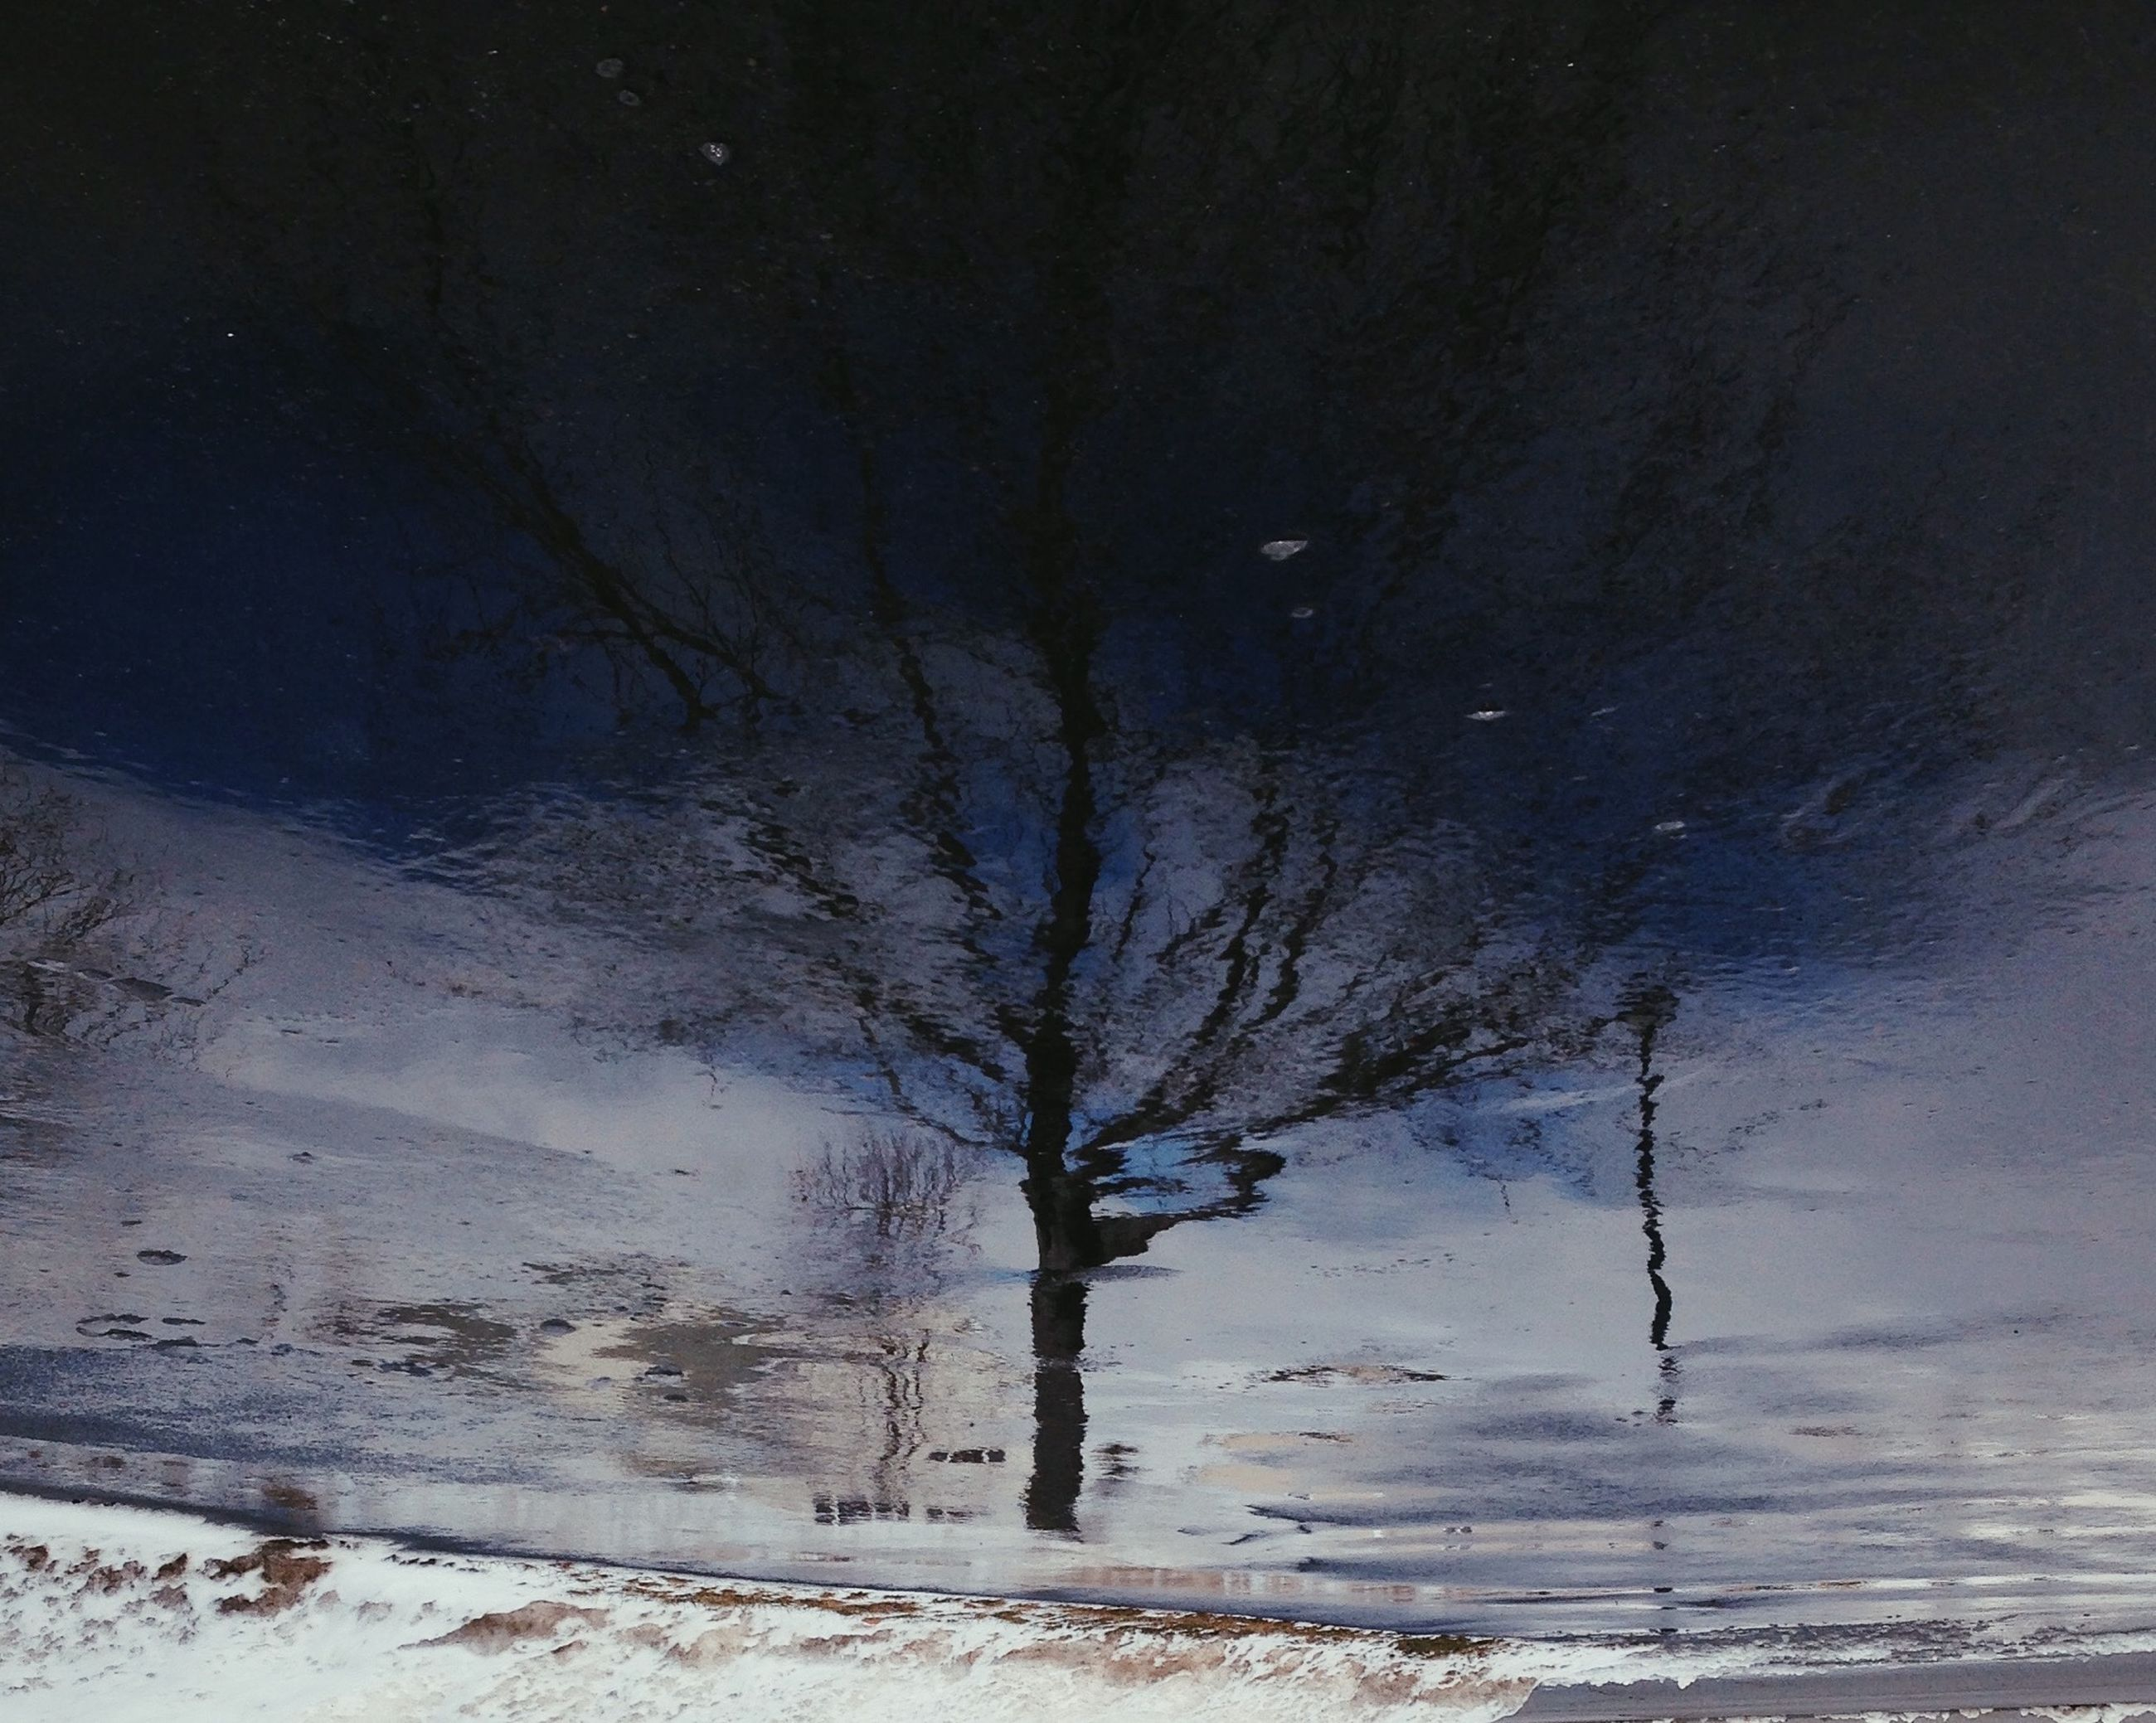 cold temperature, winter, snow, bare tree, tranquility, tree, tranquil scene, weather, branch, nature, beauty in nature, scenics, season, frozen, sky, landscape, silhouette, non-urban scene, covering, outdoors